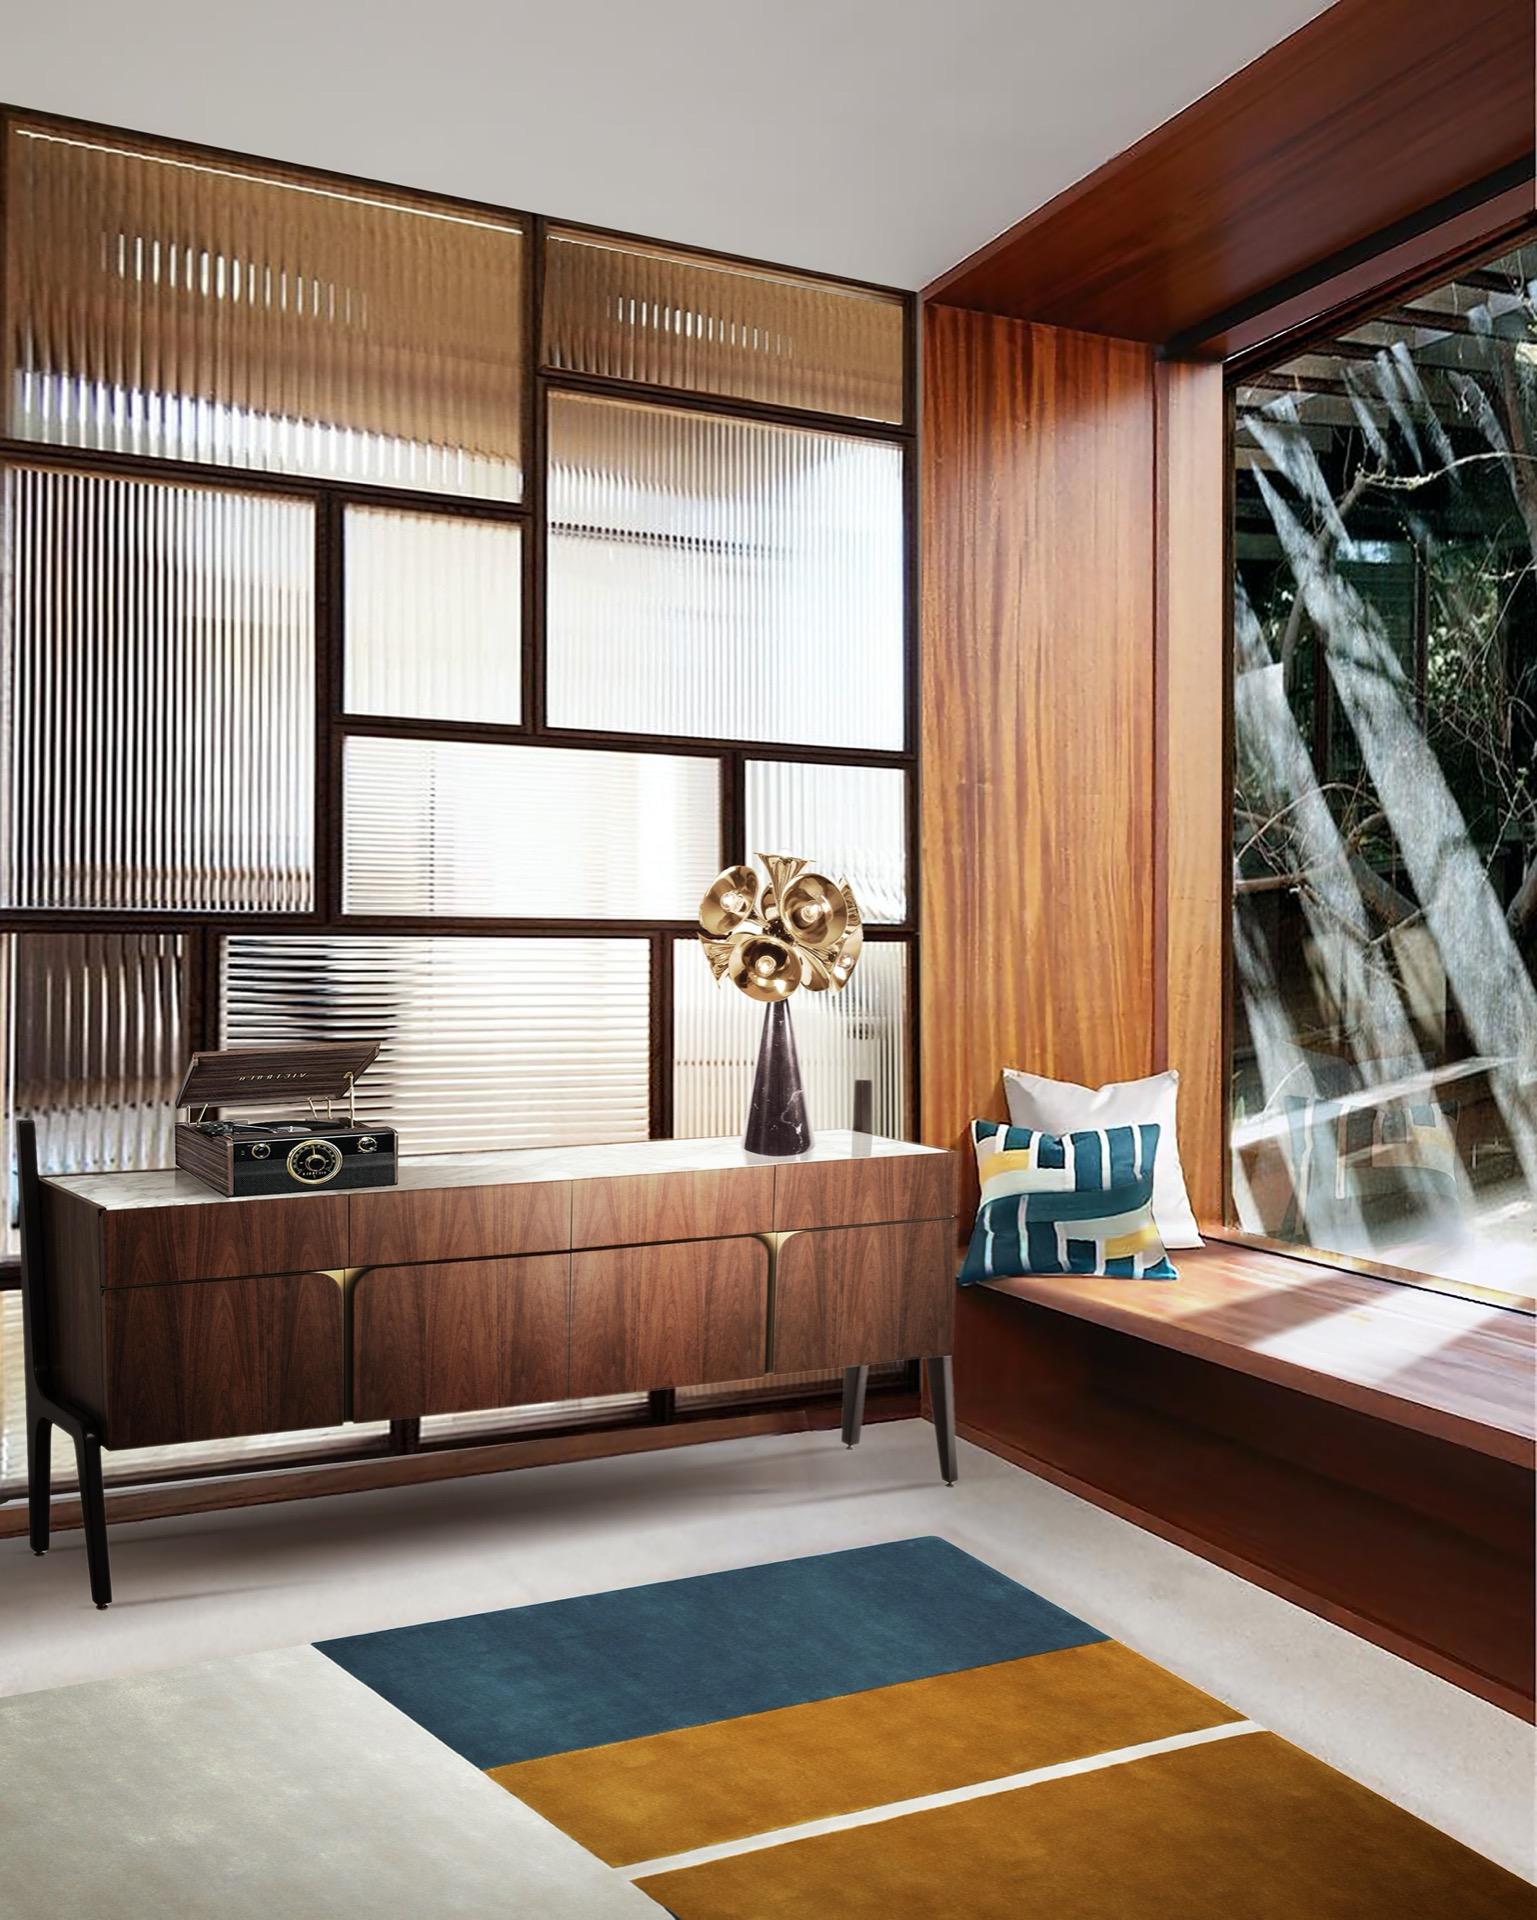 Home Inspiration Ideas, design ideas, mid-century ideas, design, home home inspiration ideas